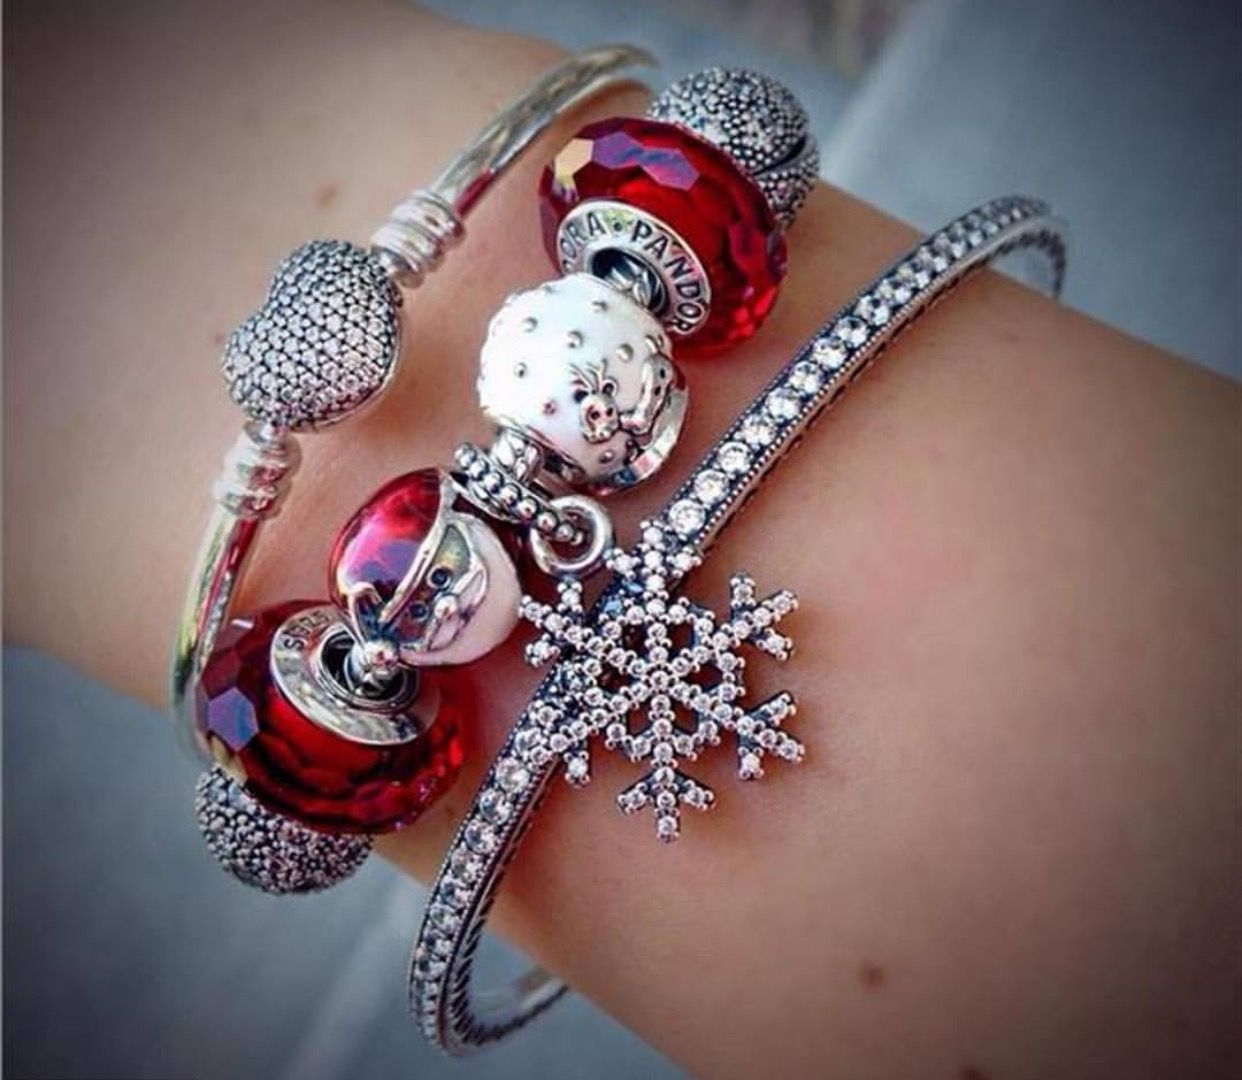 eebc3b01f Pandora | Pandora & Jewish Charms | Pinterest | Bracelets, Jewlery ...